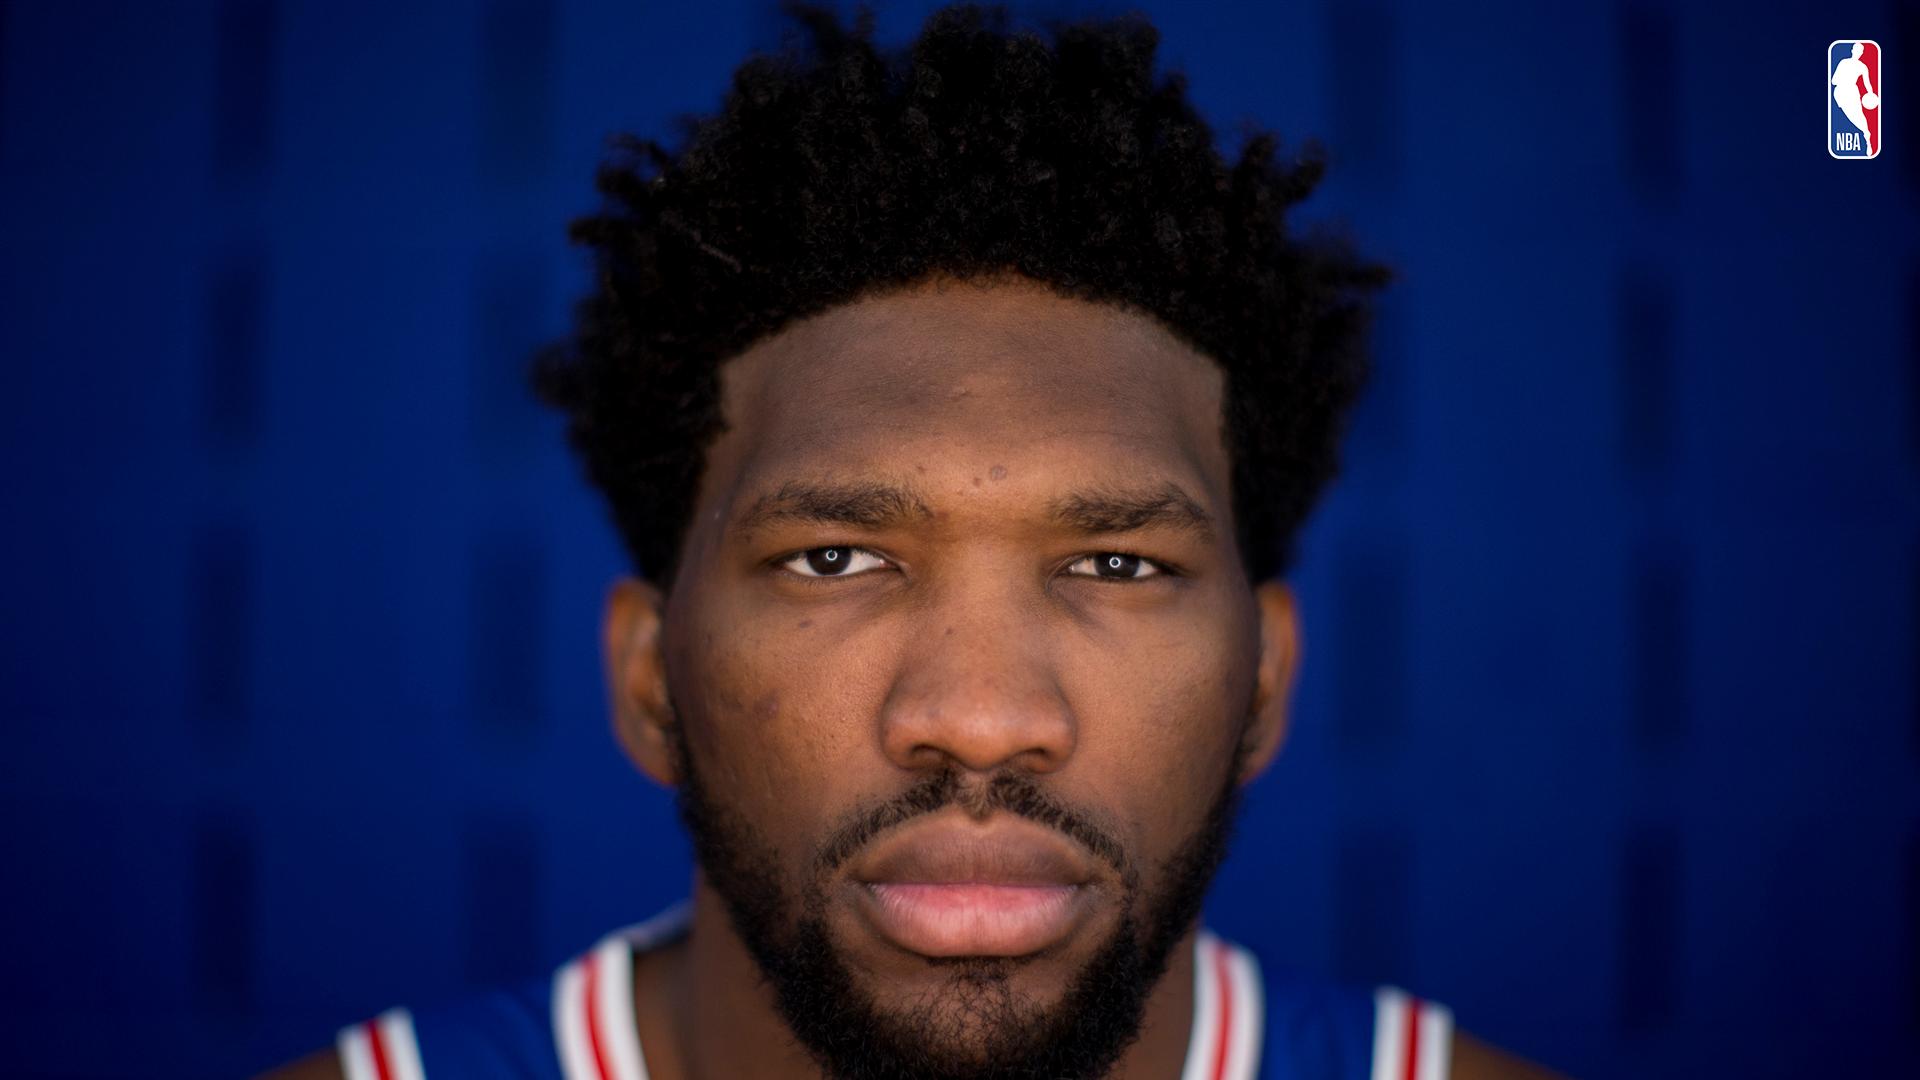 Joel Embiid, jugador de los Sixers